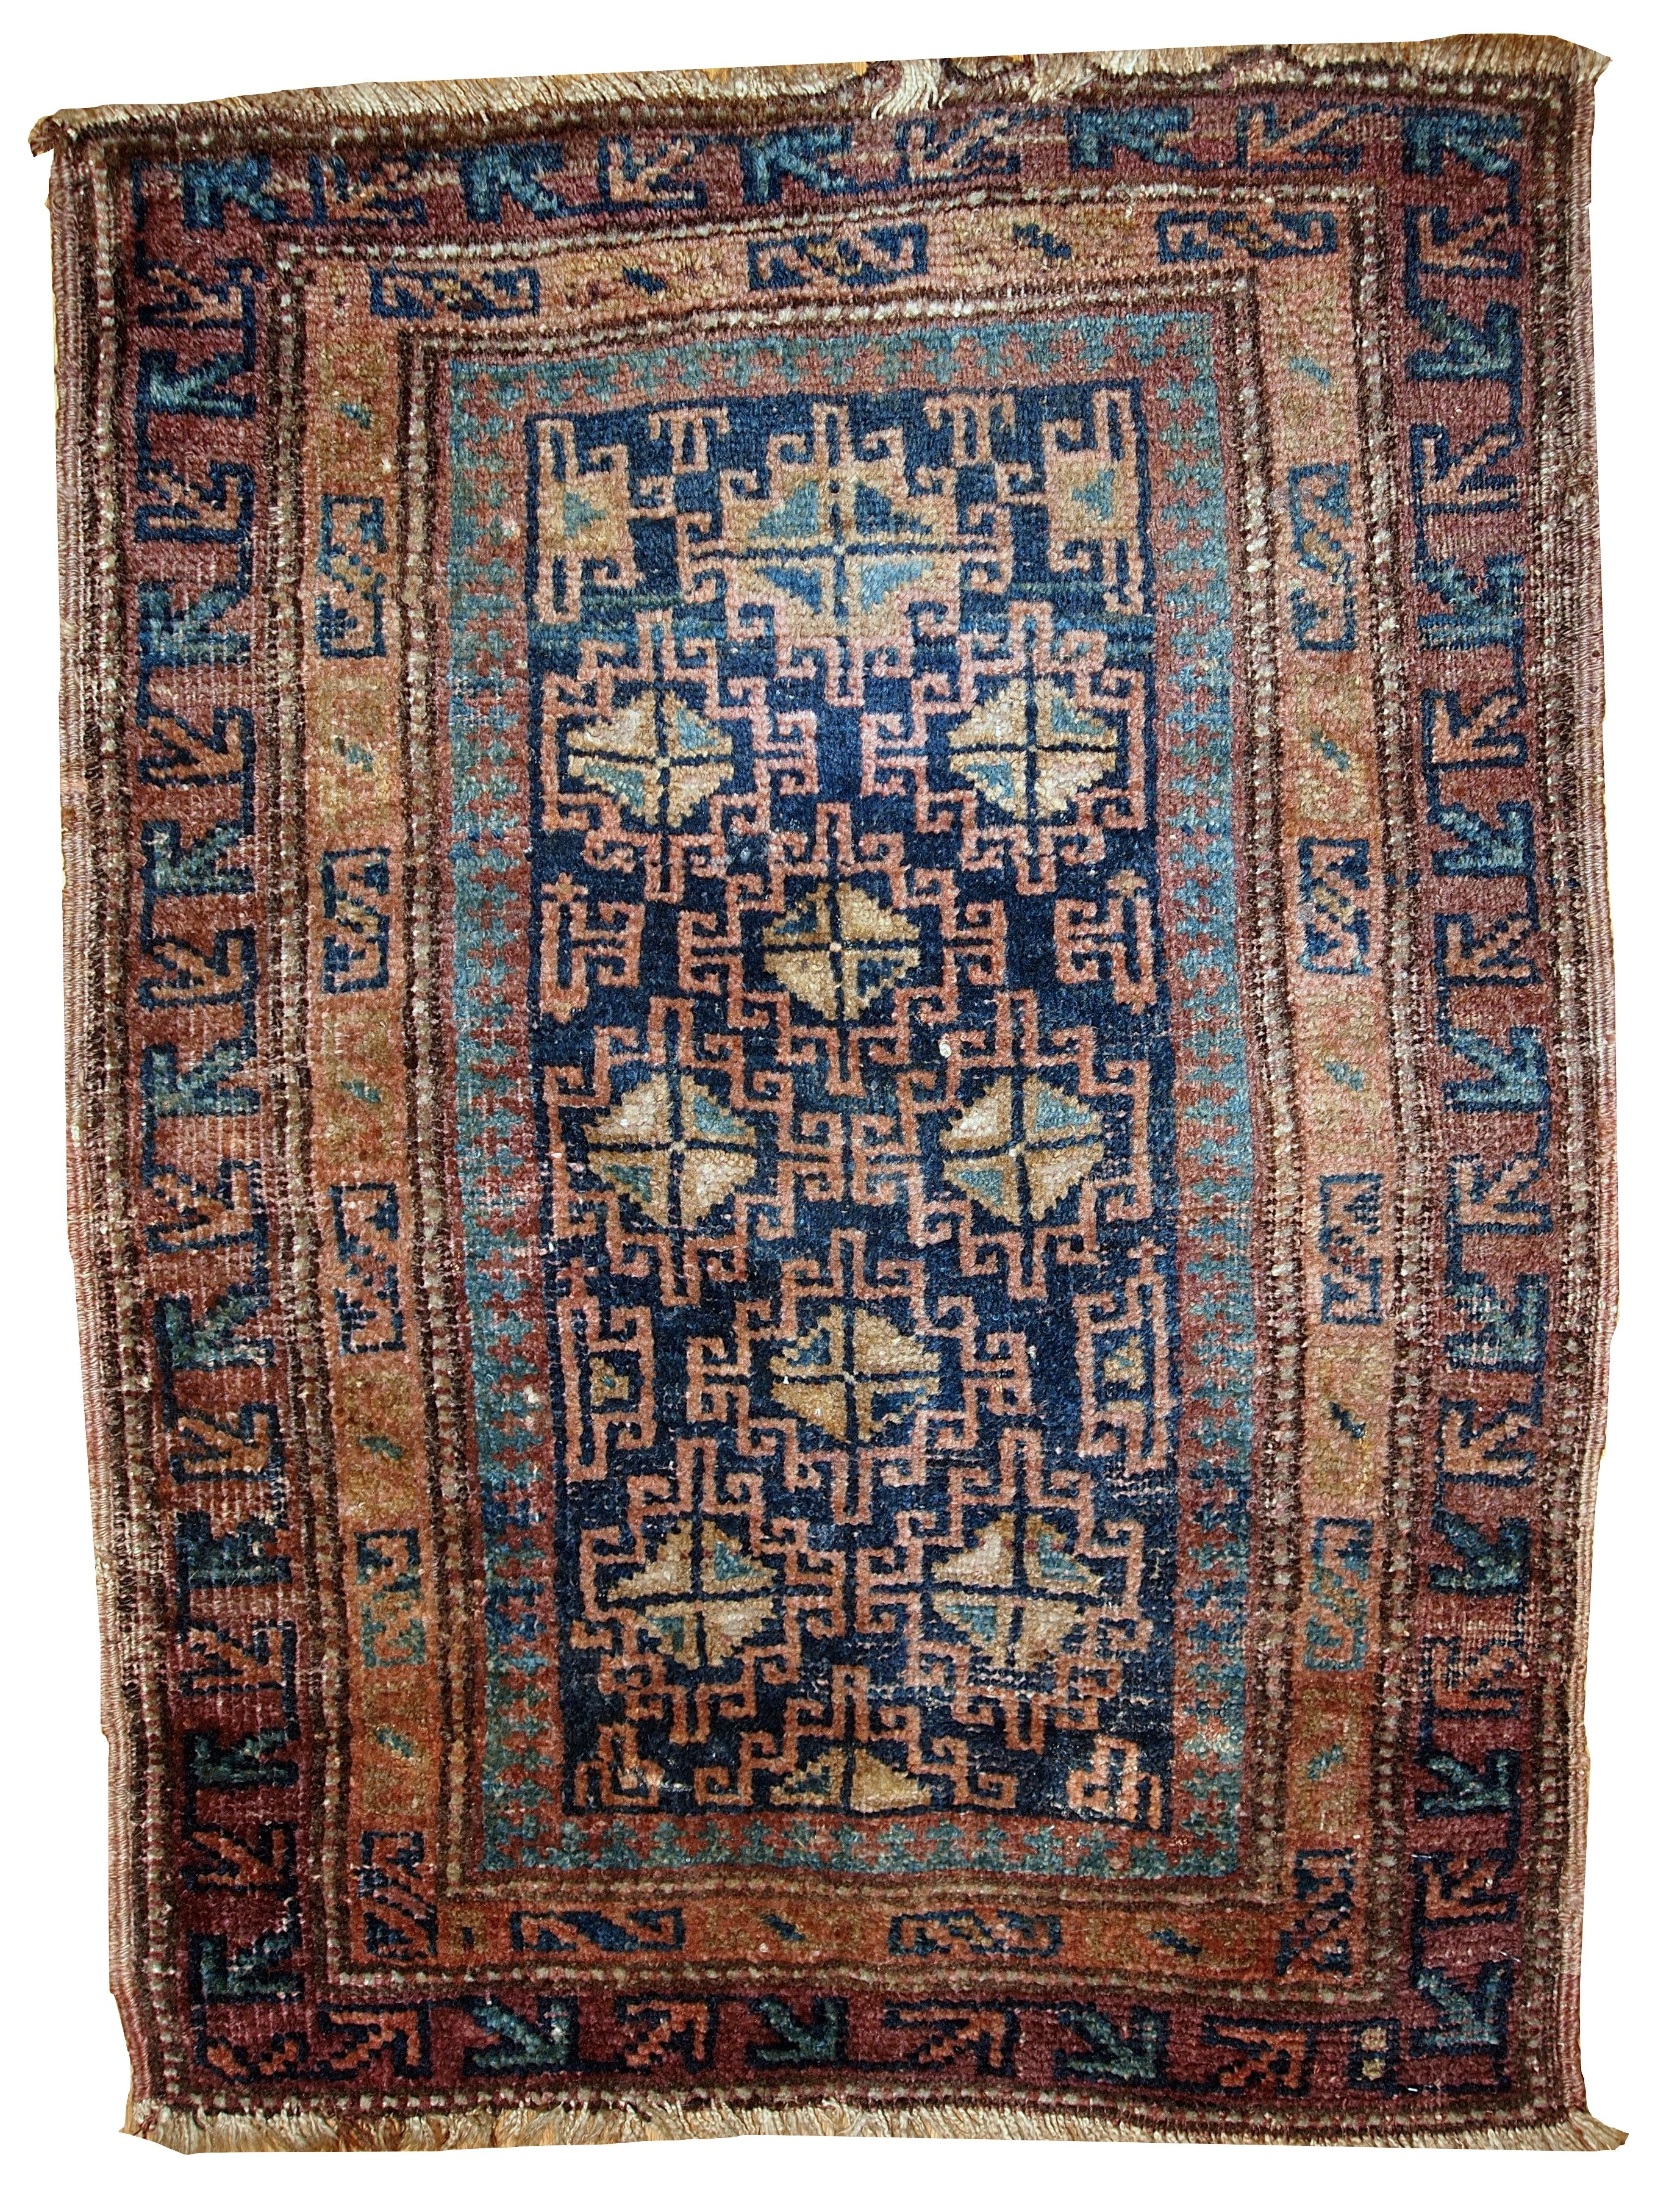 Handmade antique Persian Kurdish rug 2.1' x 2.9' ( 66cm x